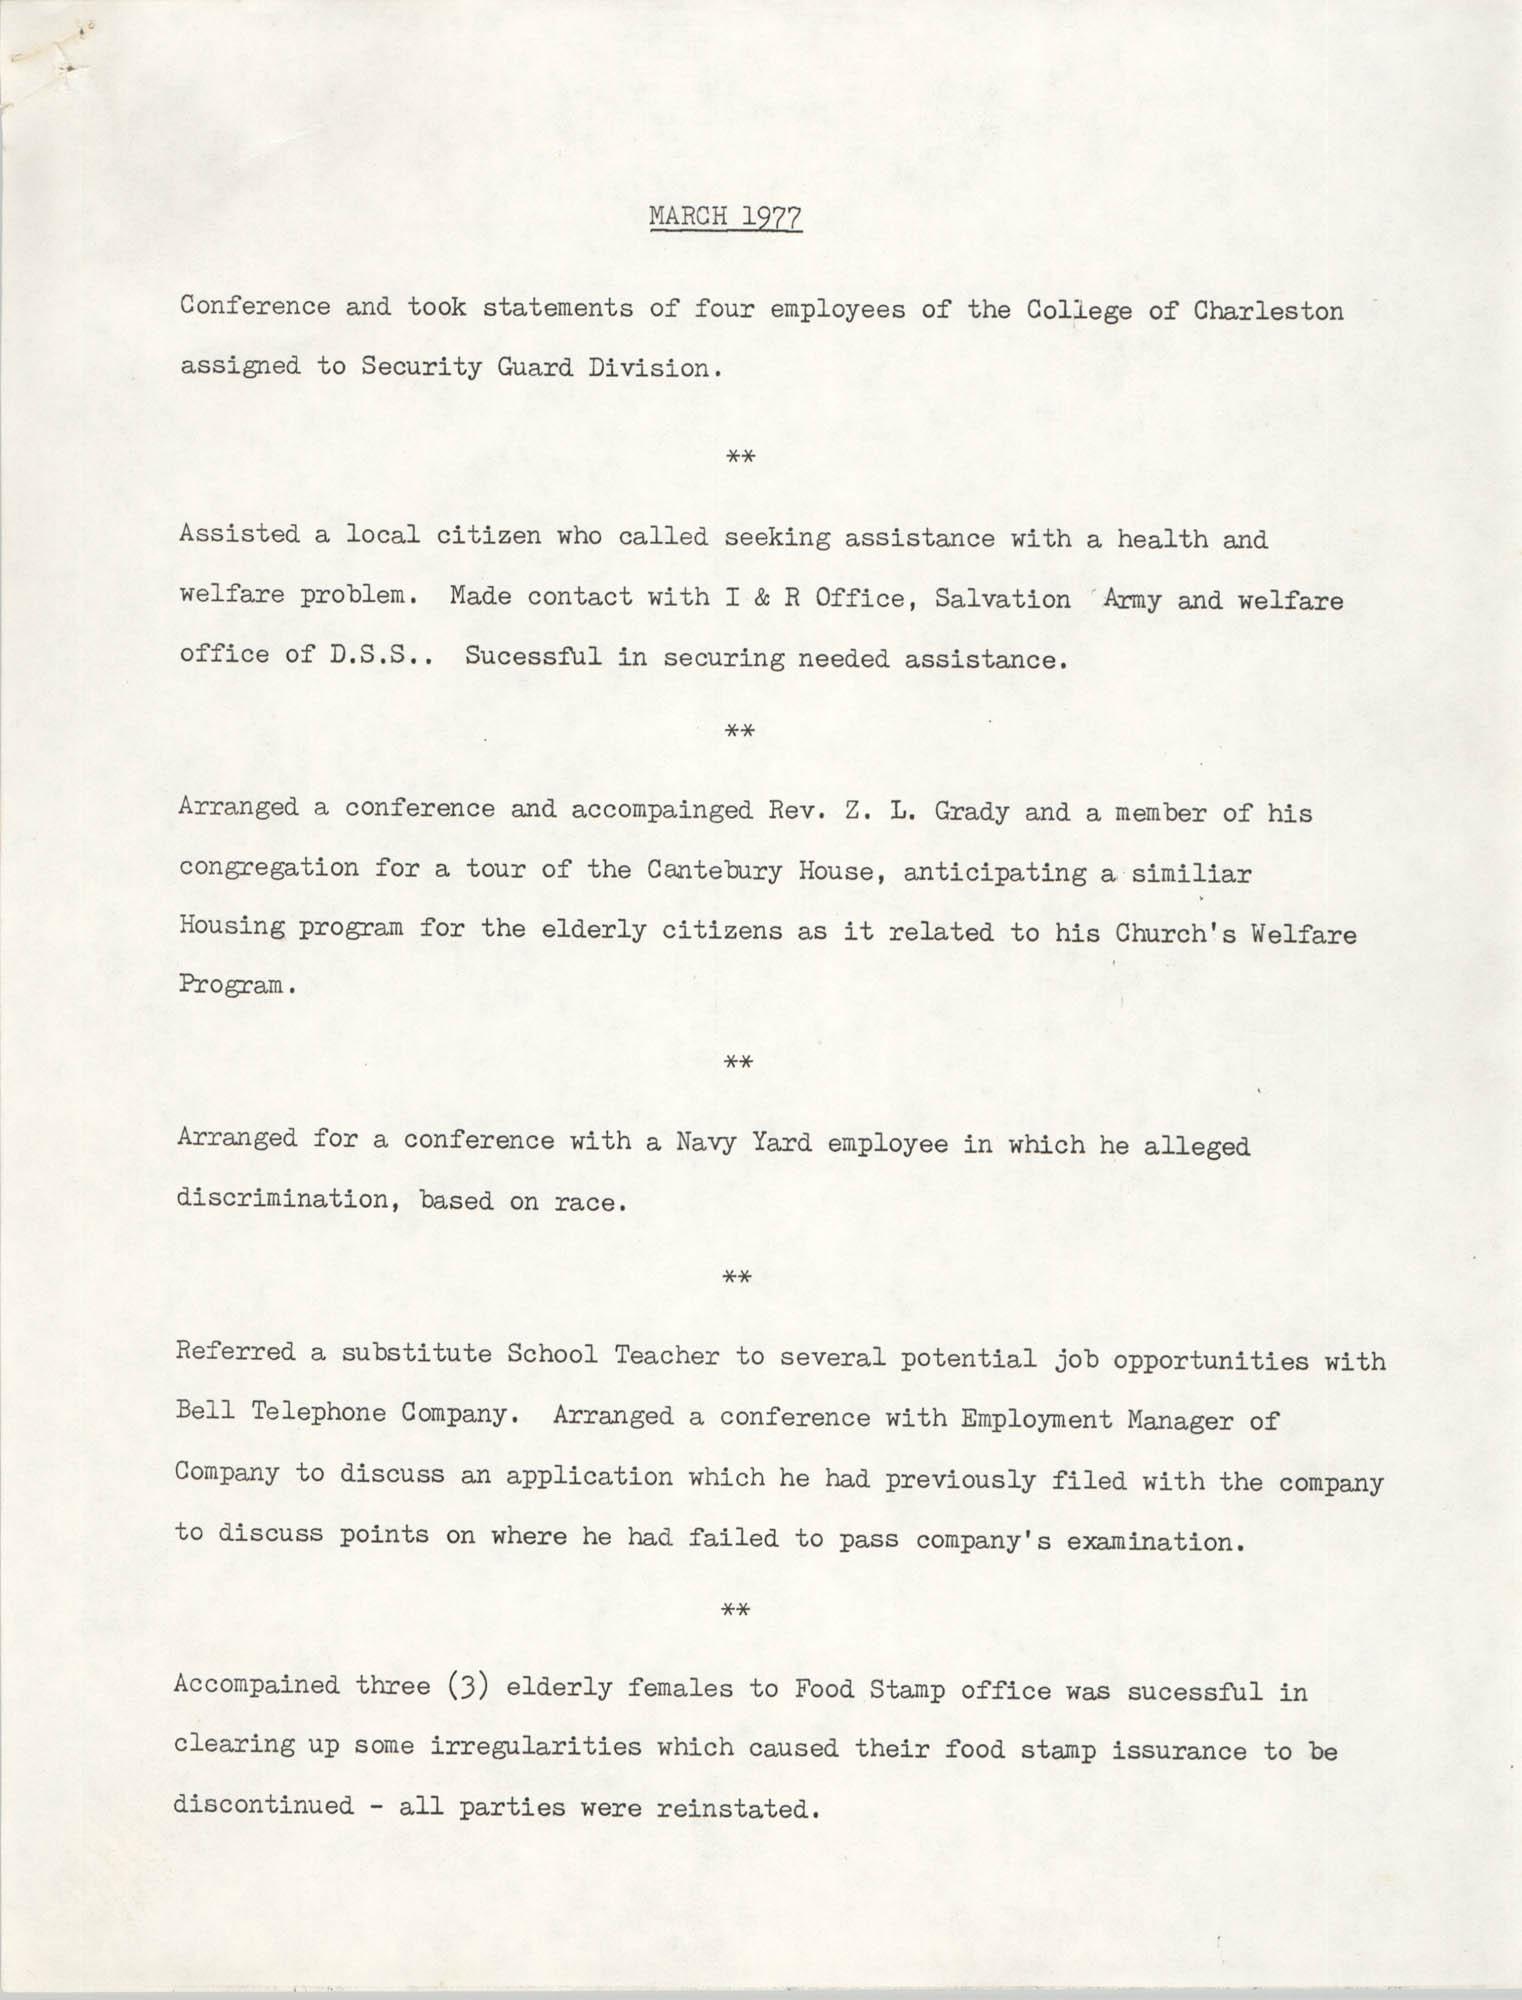 COBRA, March 1977